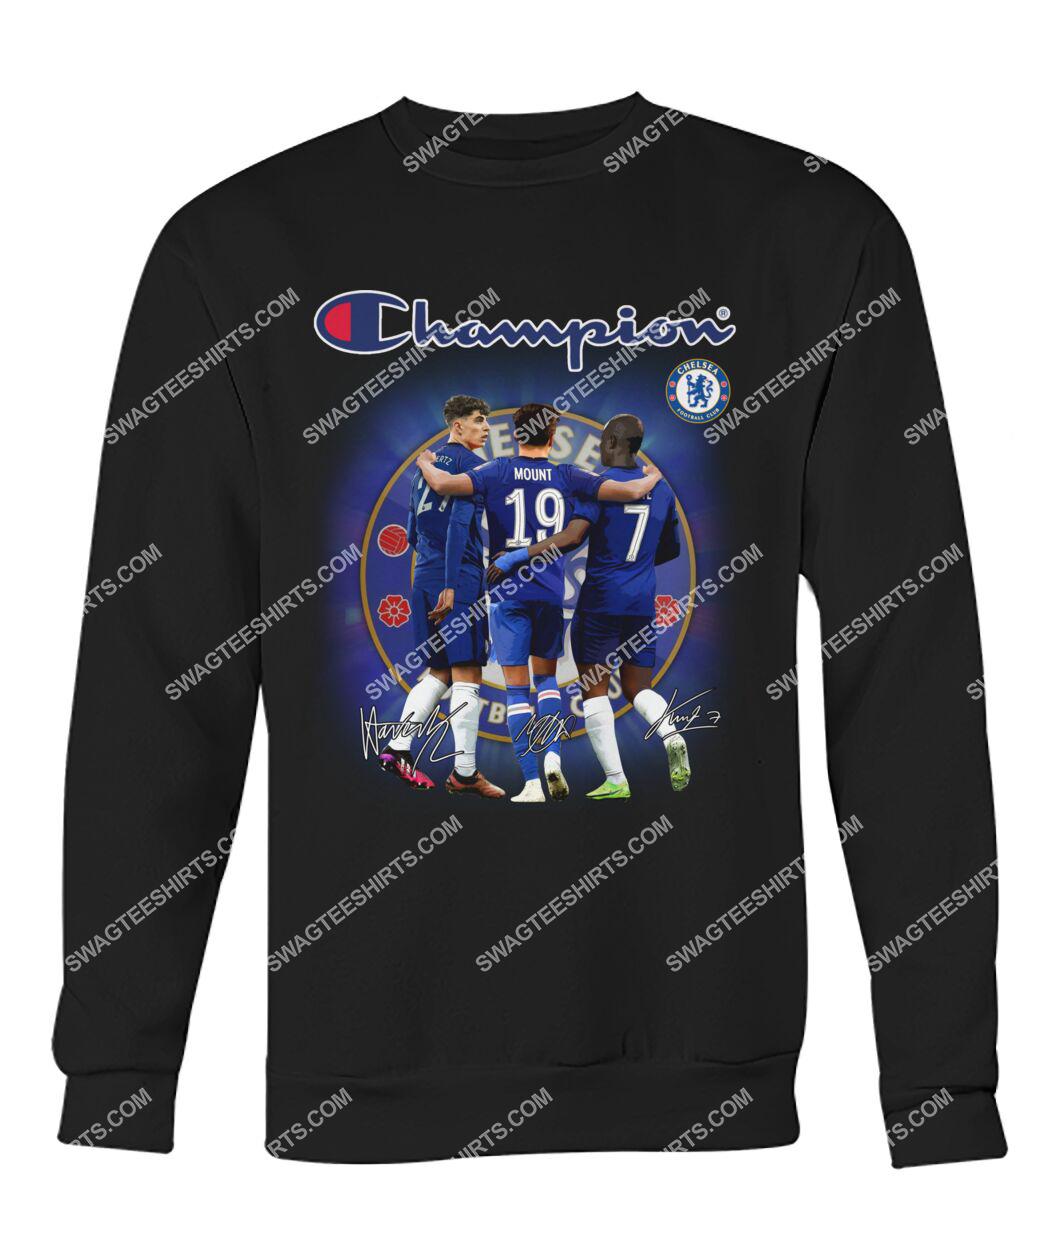 champion chelsea football club mason mount sweatshirt 1